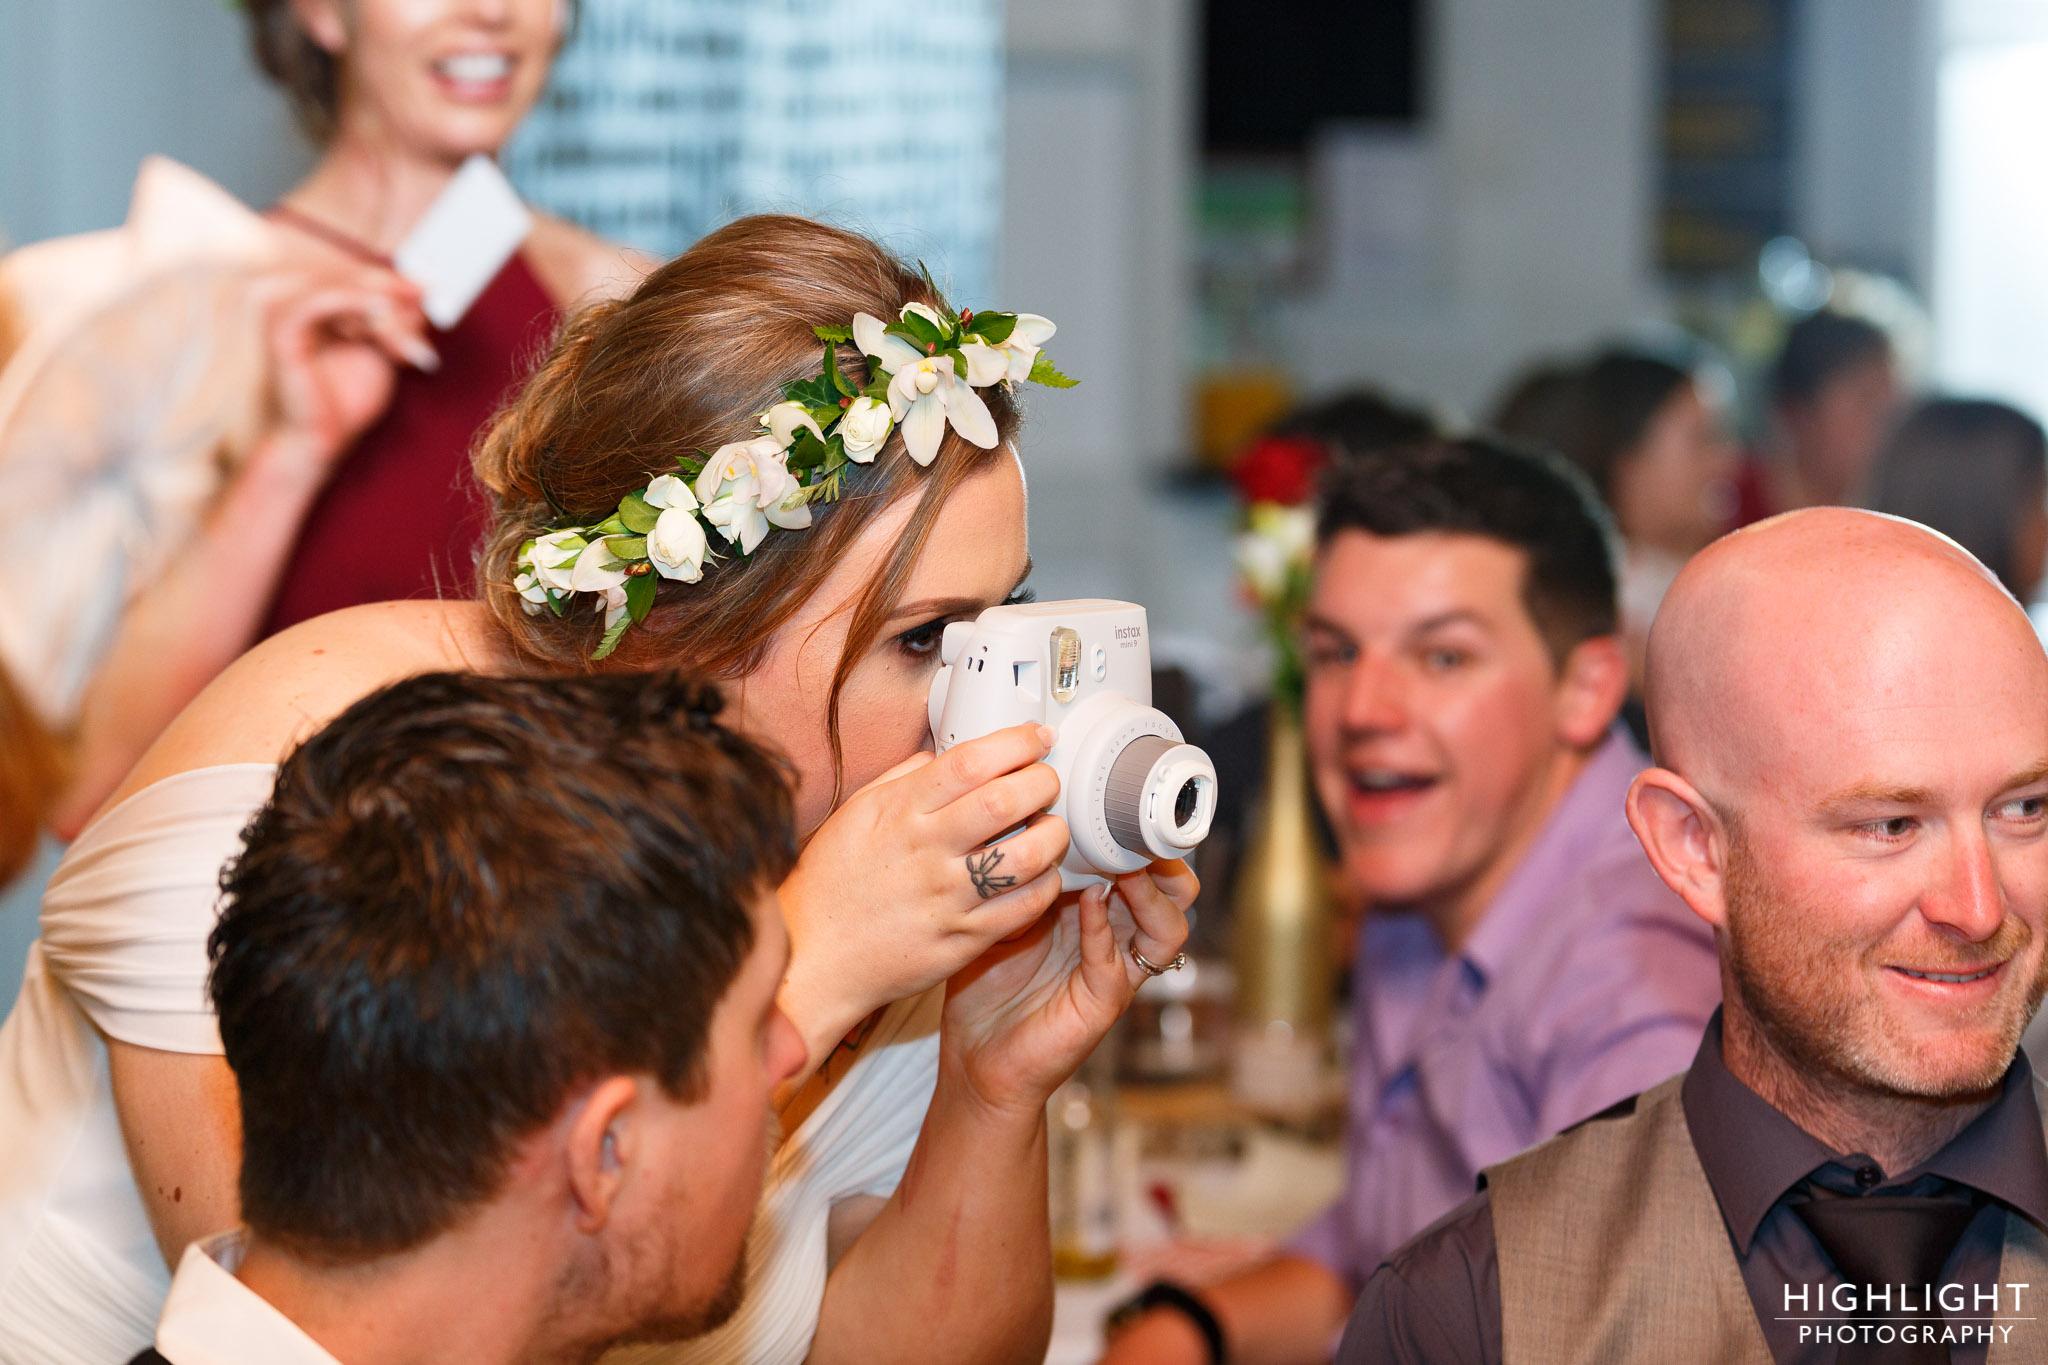 Highlight-wedding-photography-new-zealand-palmerston-north-124.jpg